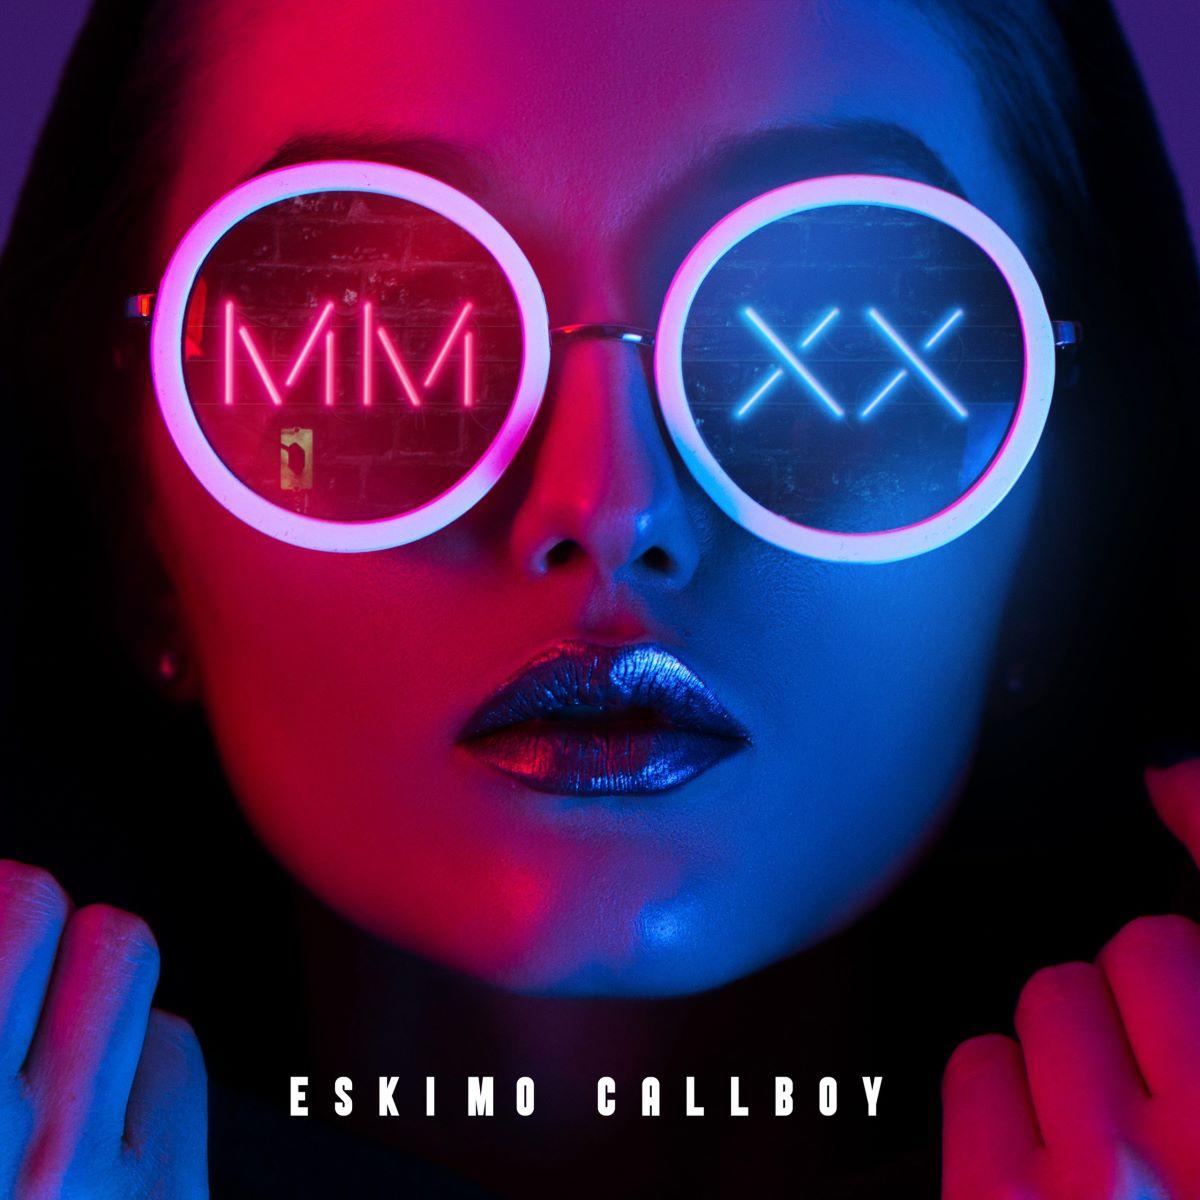 eskimo callboy - mmxx - album cover